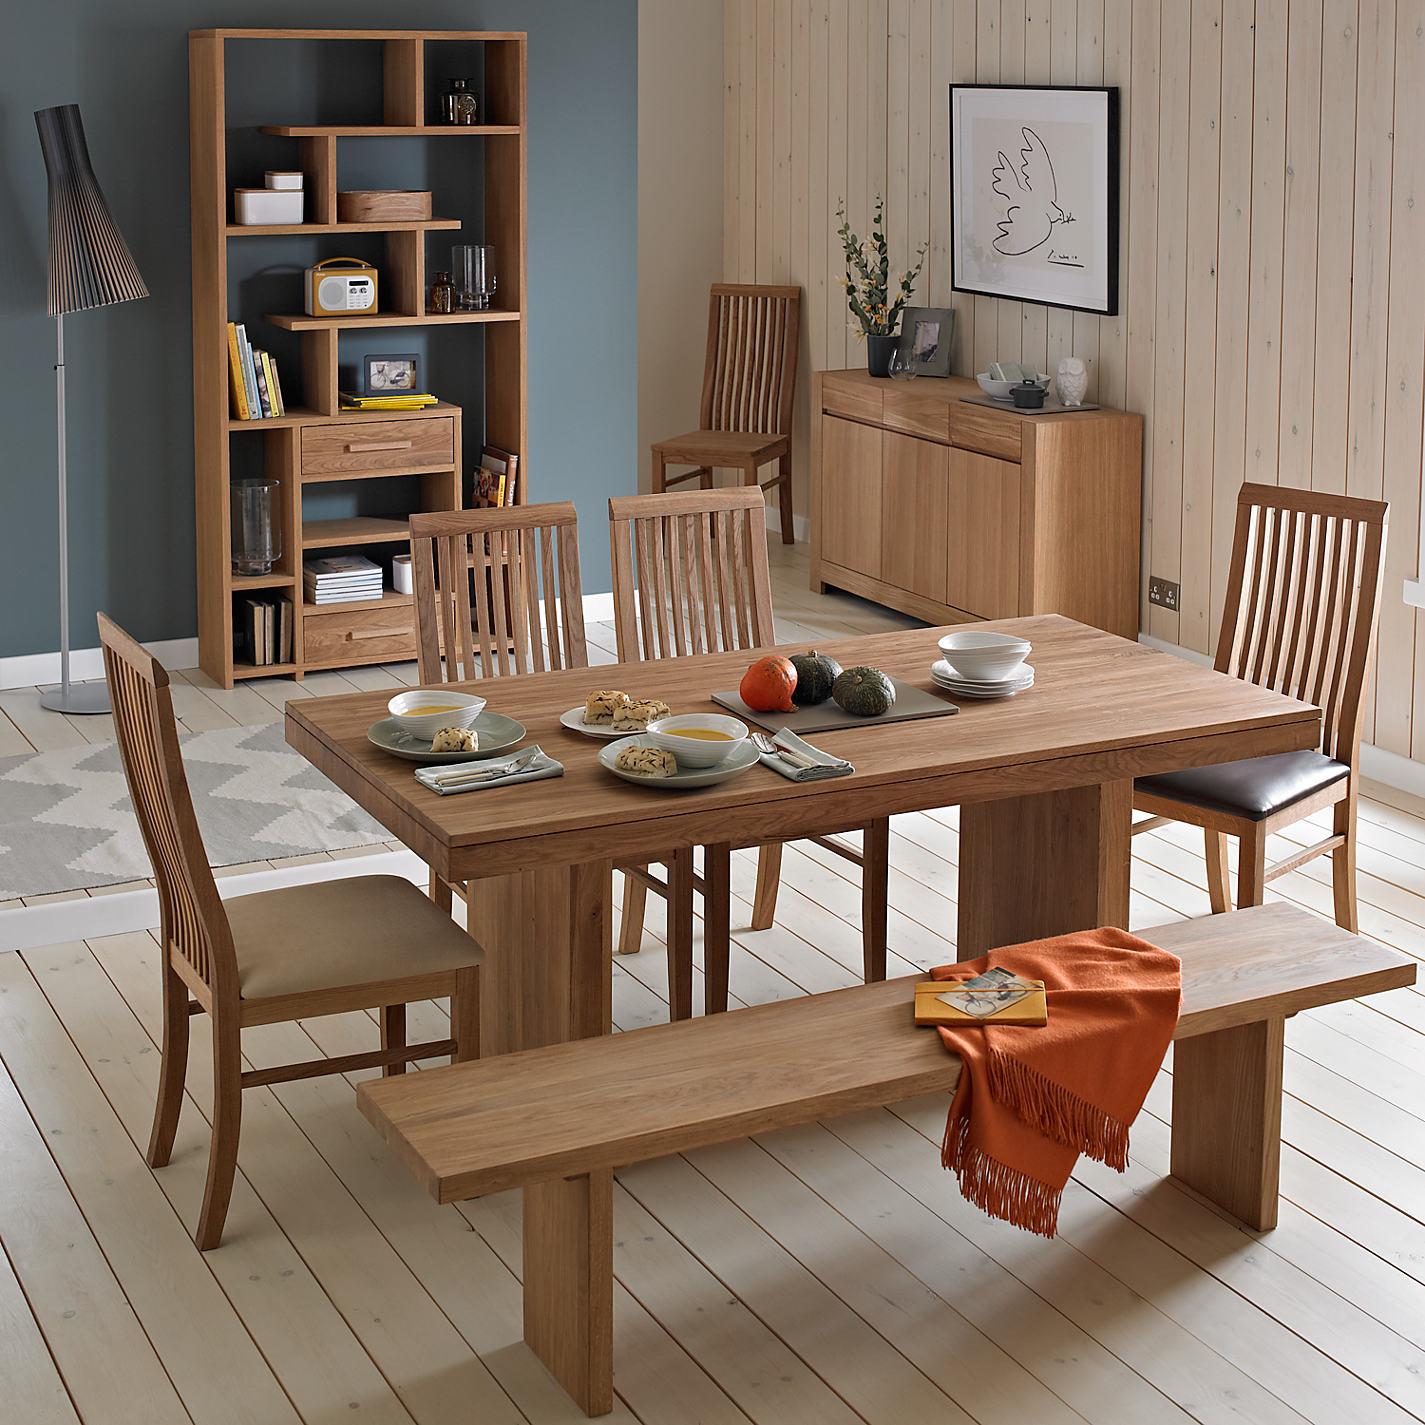 Buy John Lewis Henry Living U0026 Dining Room Furniture Online At Johnlewis. ...